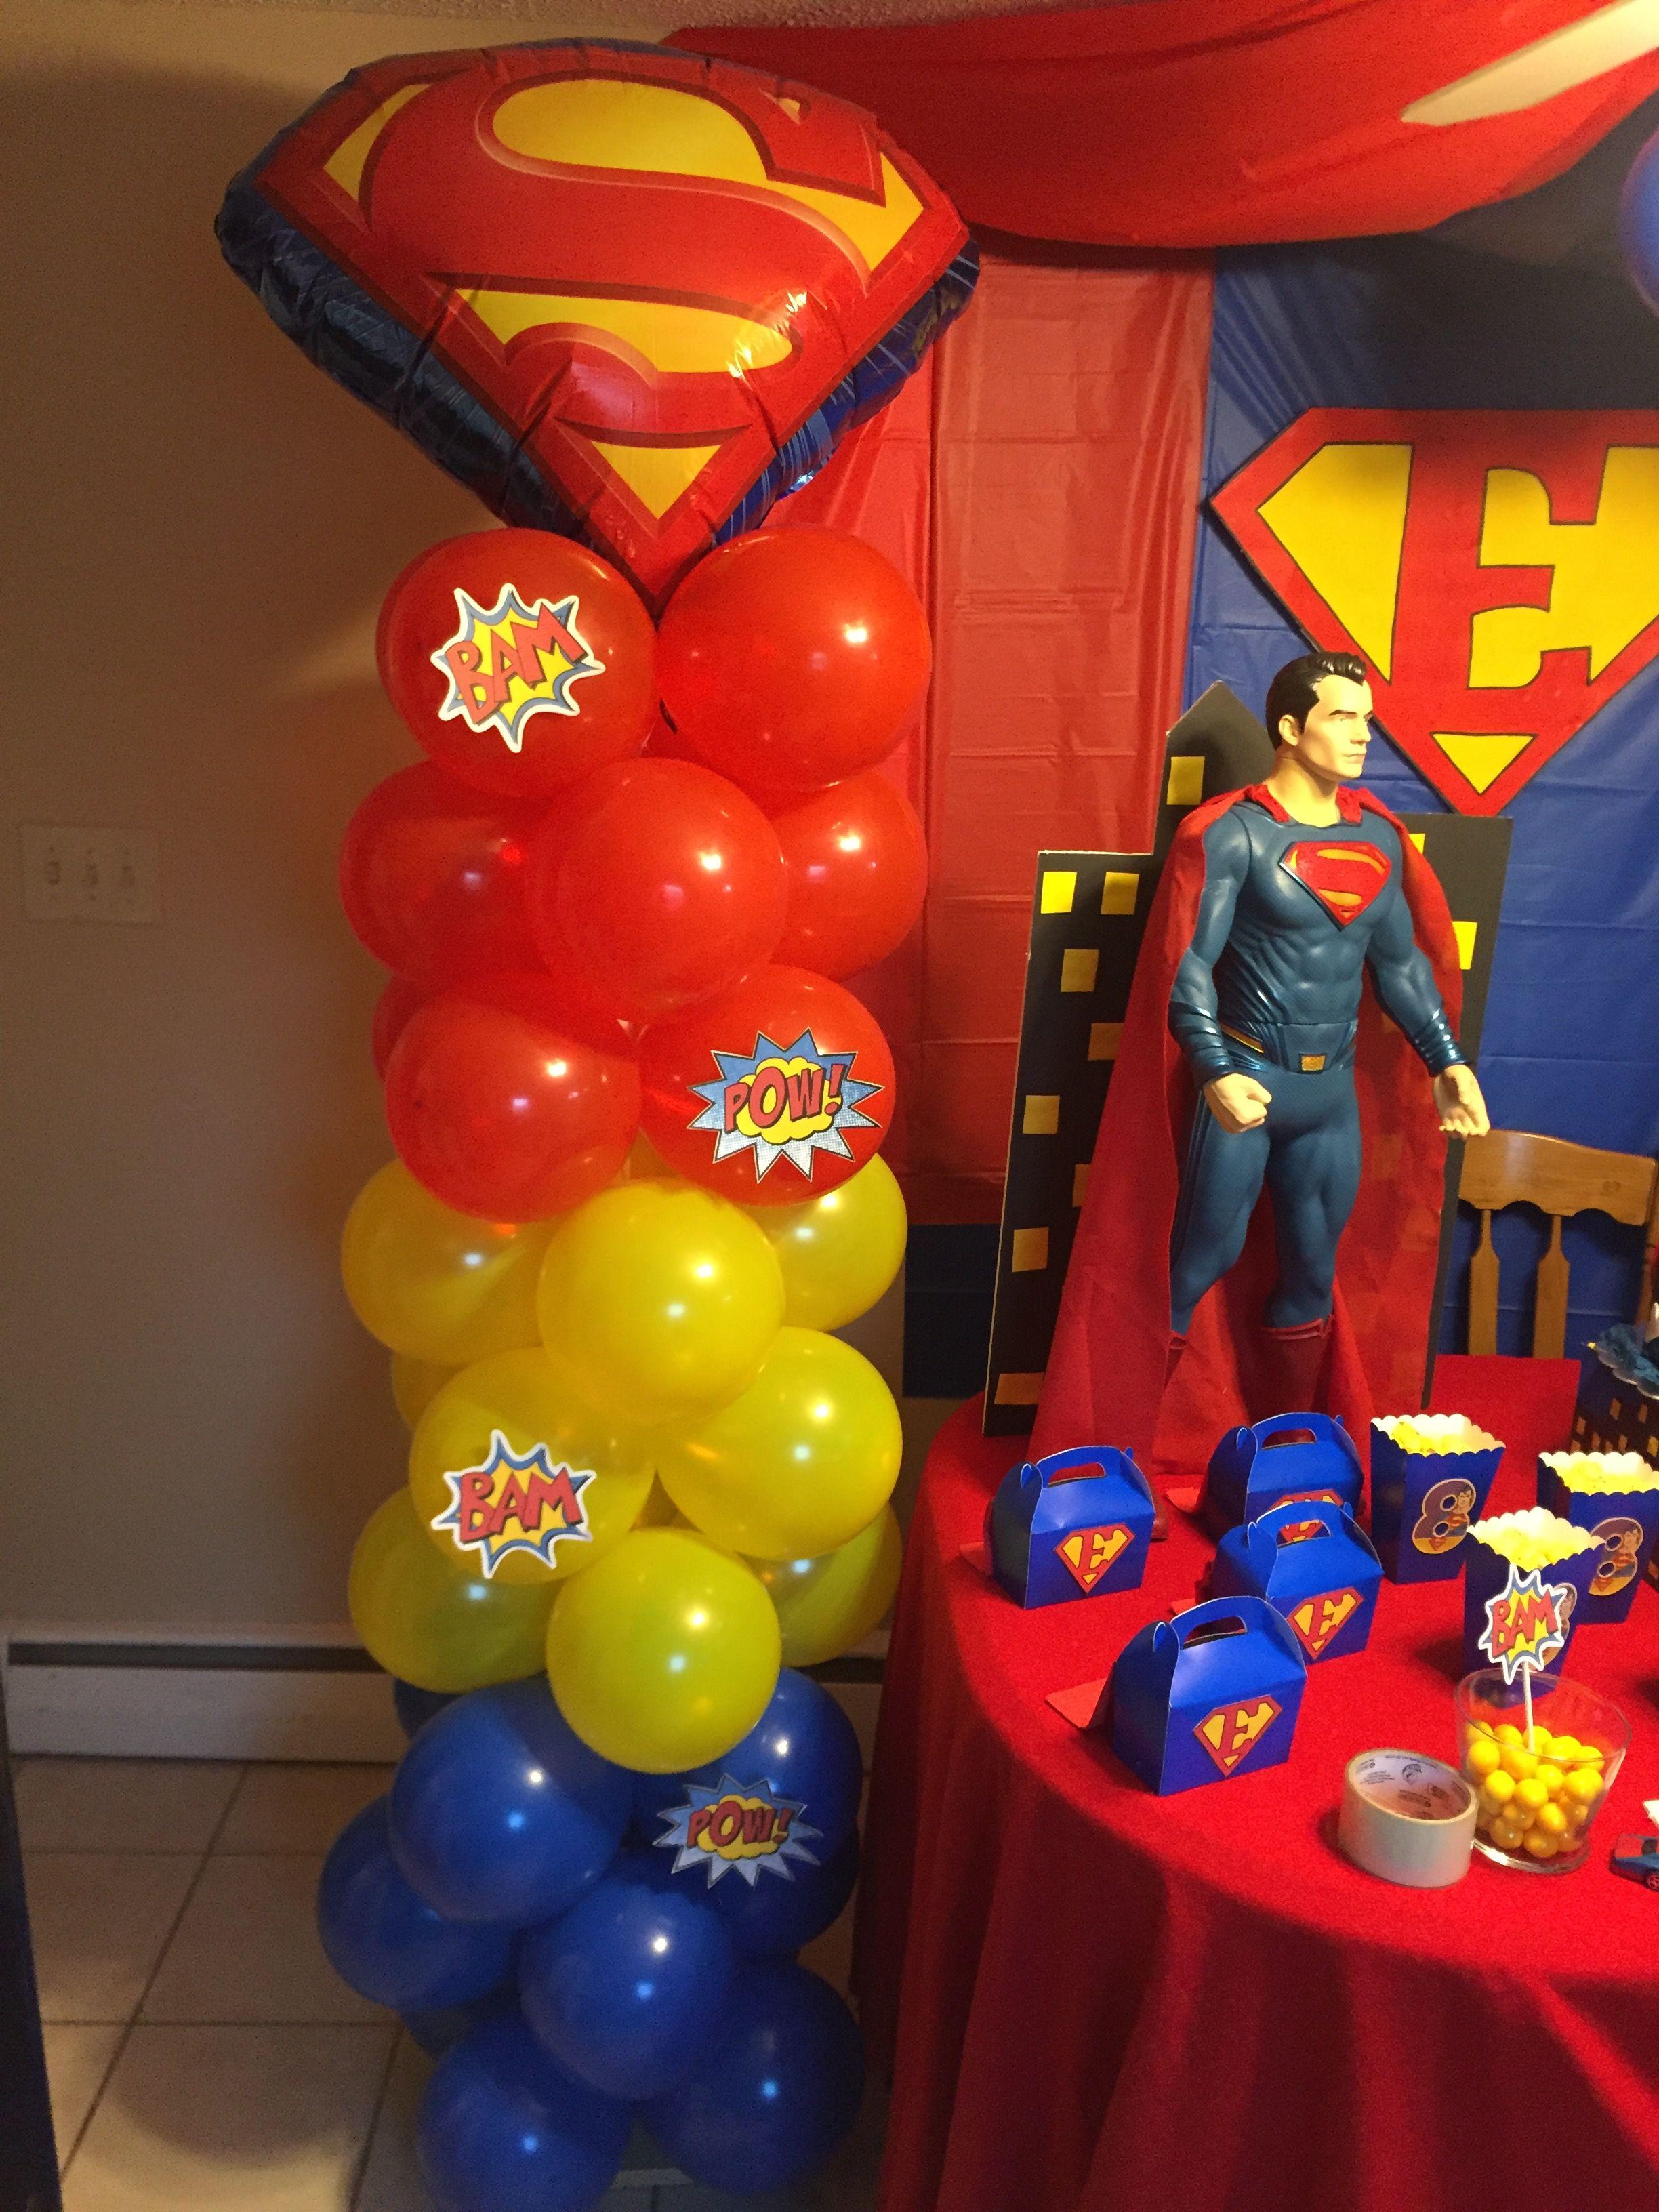 Superman Balloon Decor Party Decorations Birthday Halloween